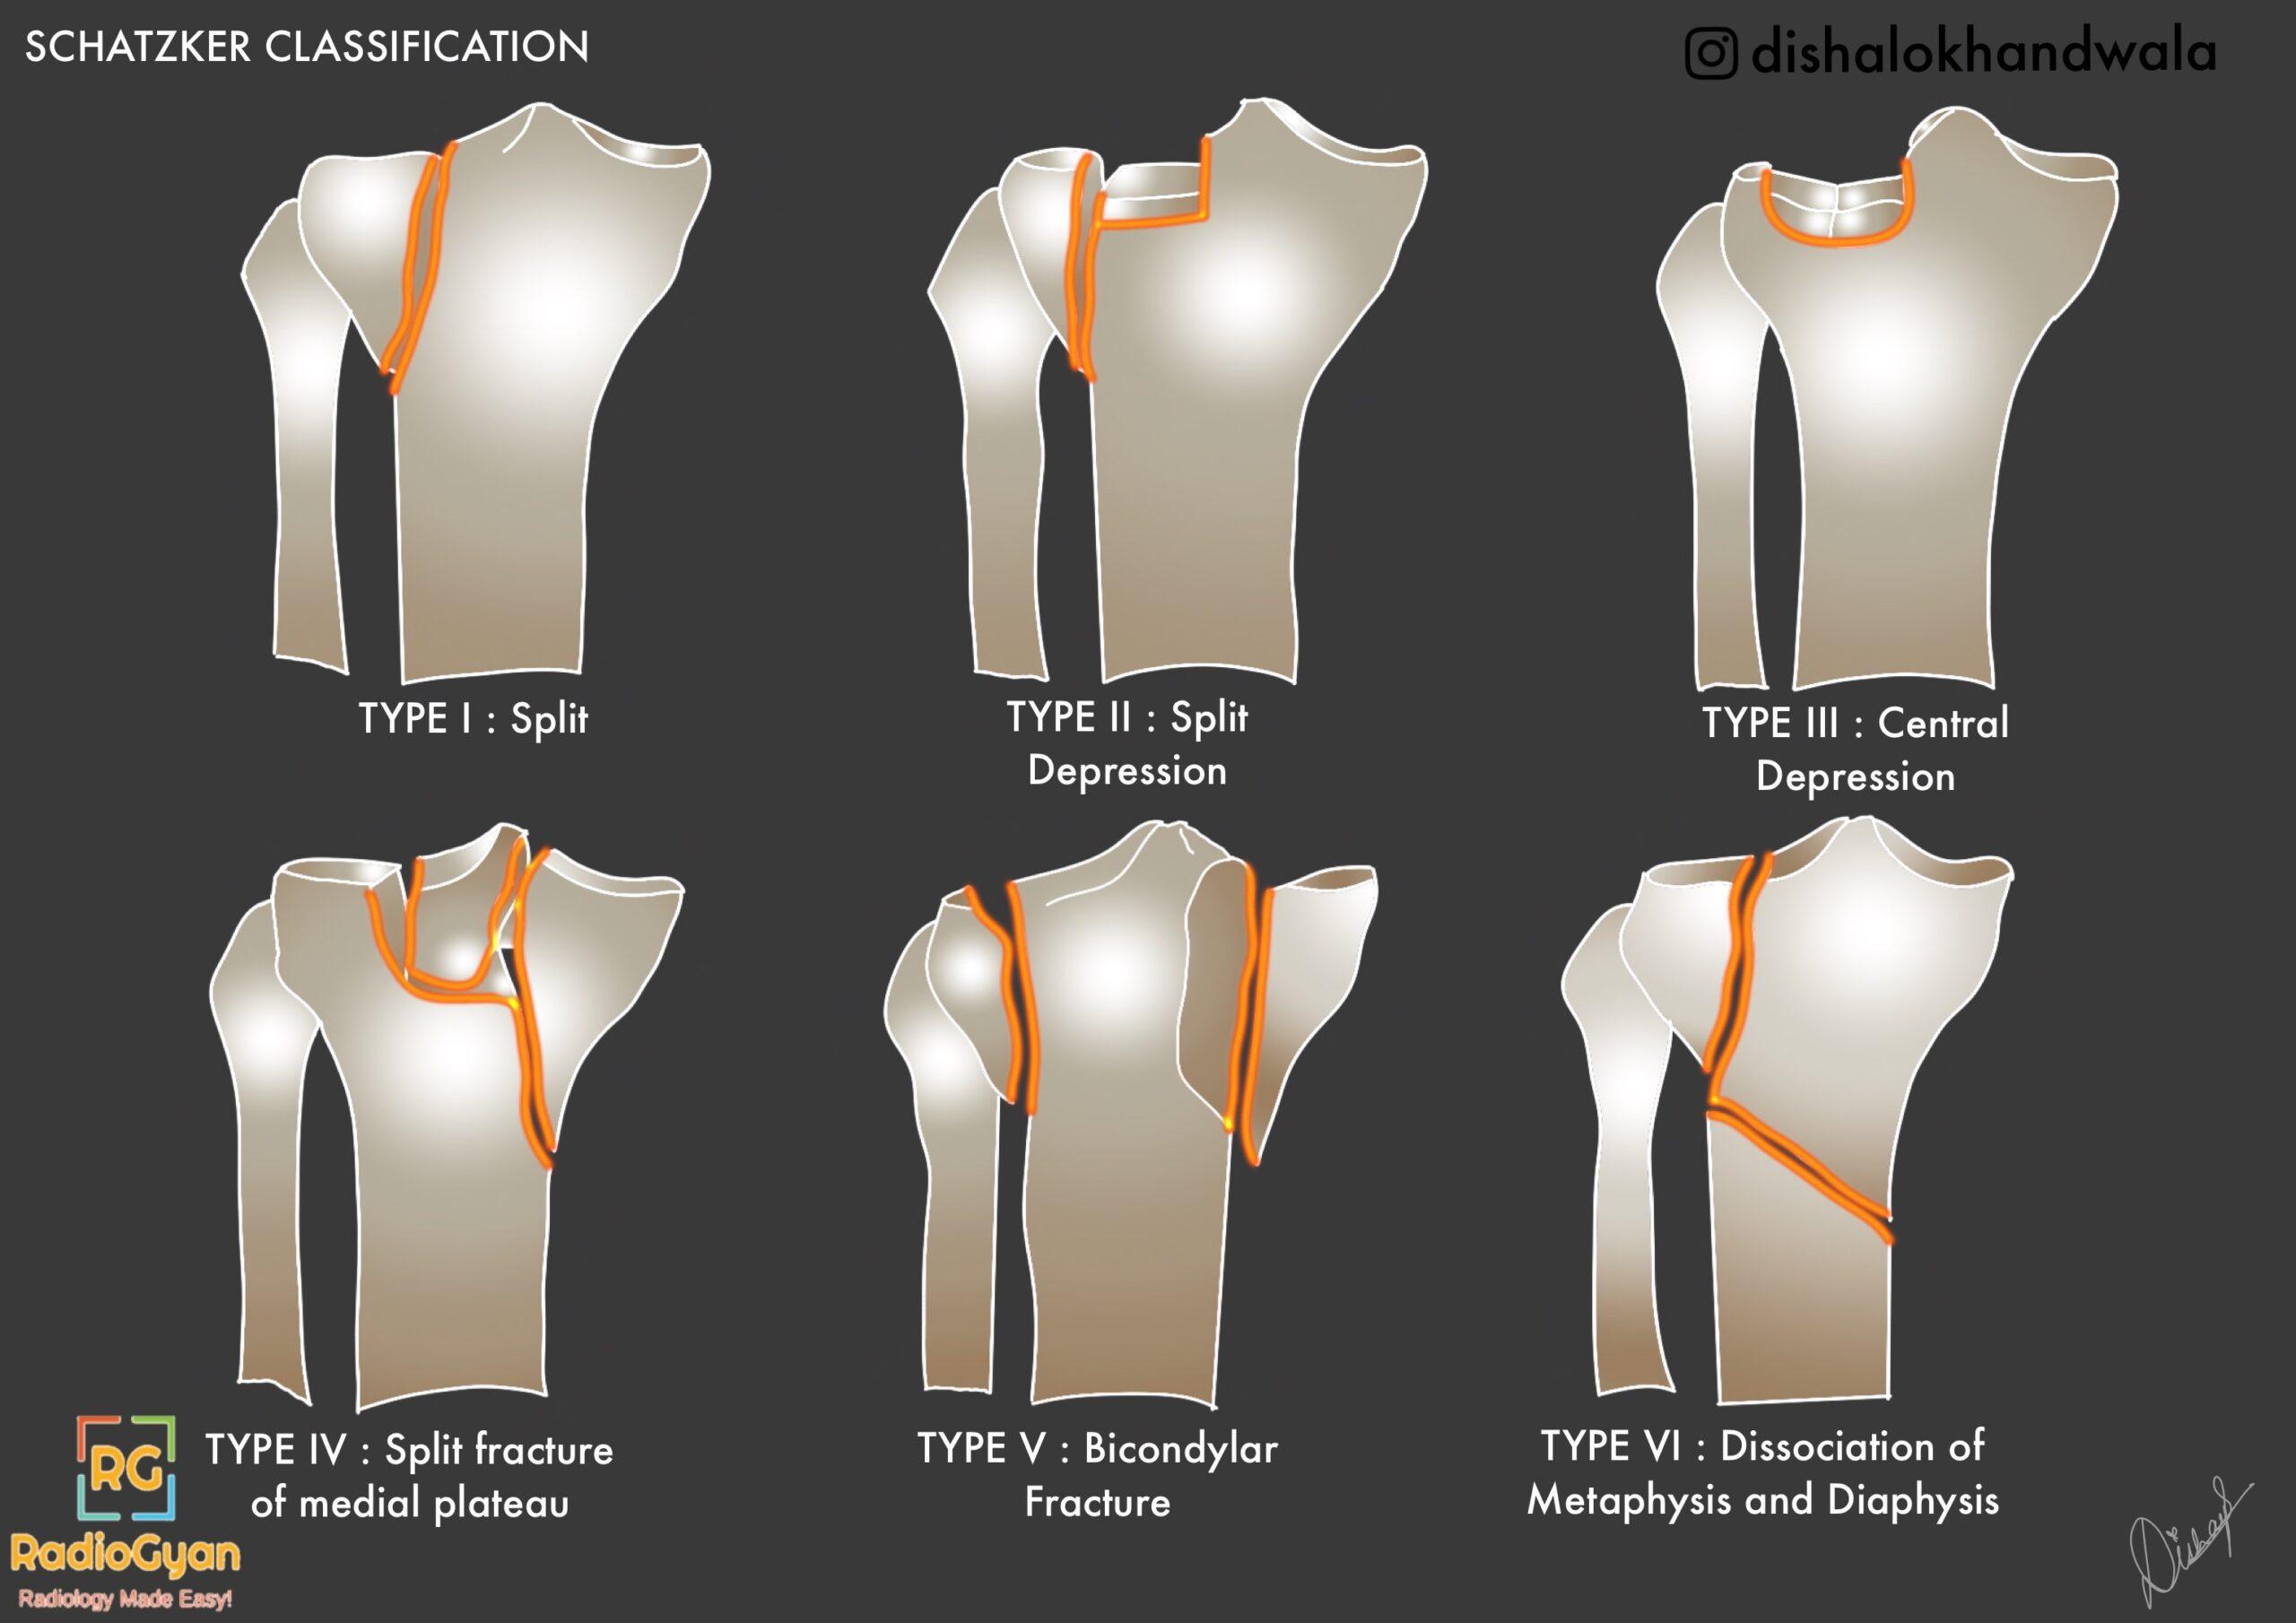 Schatzker classification of tibial plateau fractures